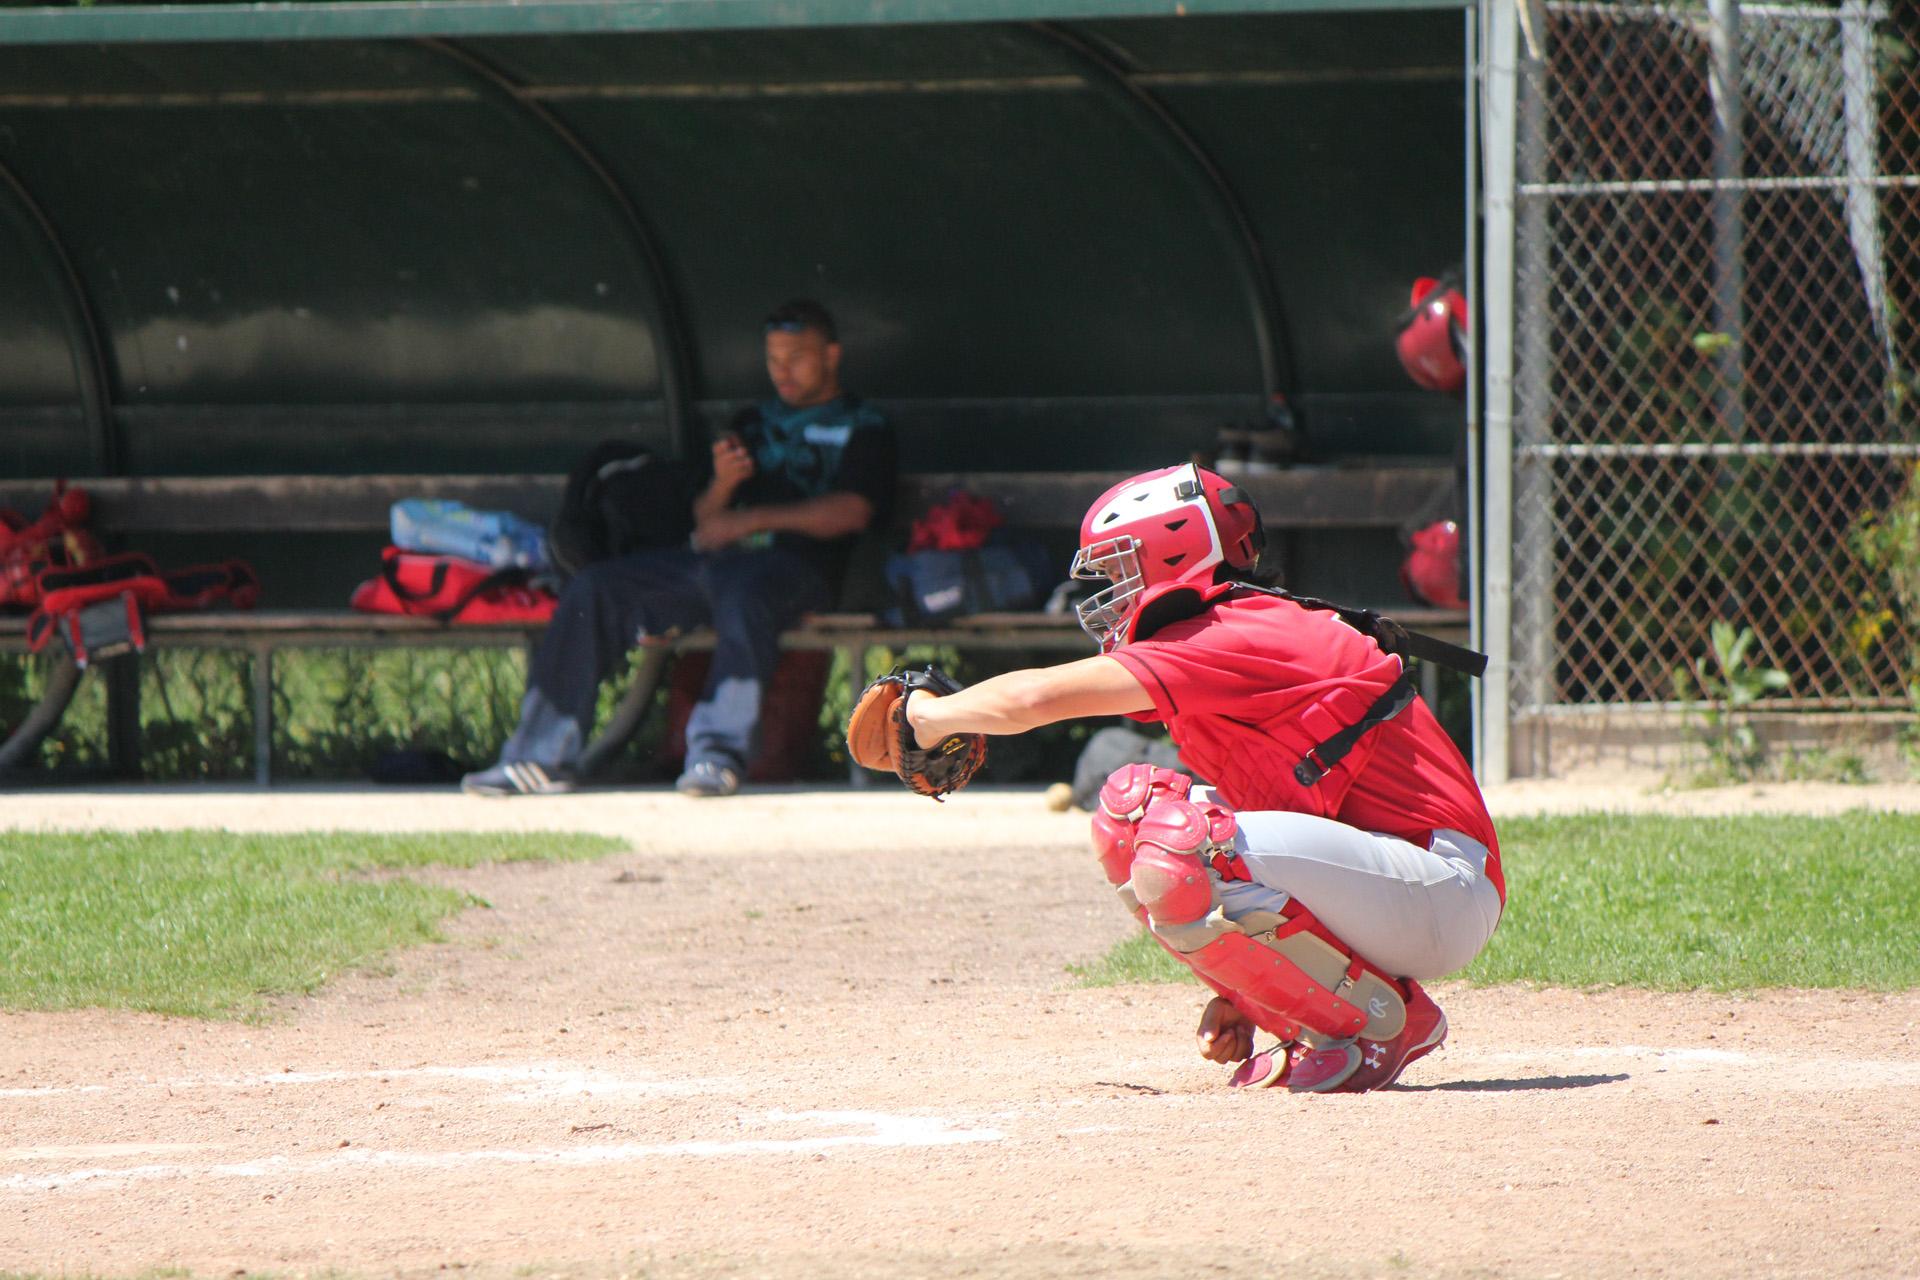 2011-06-26 Baseball (13)